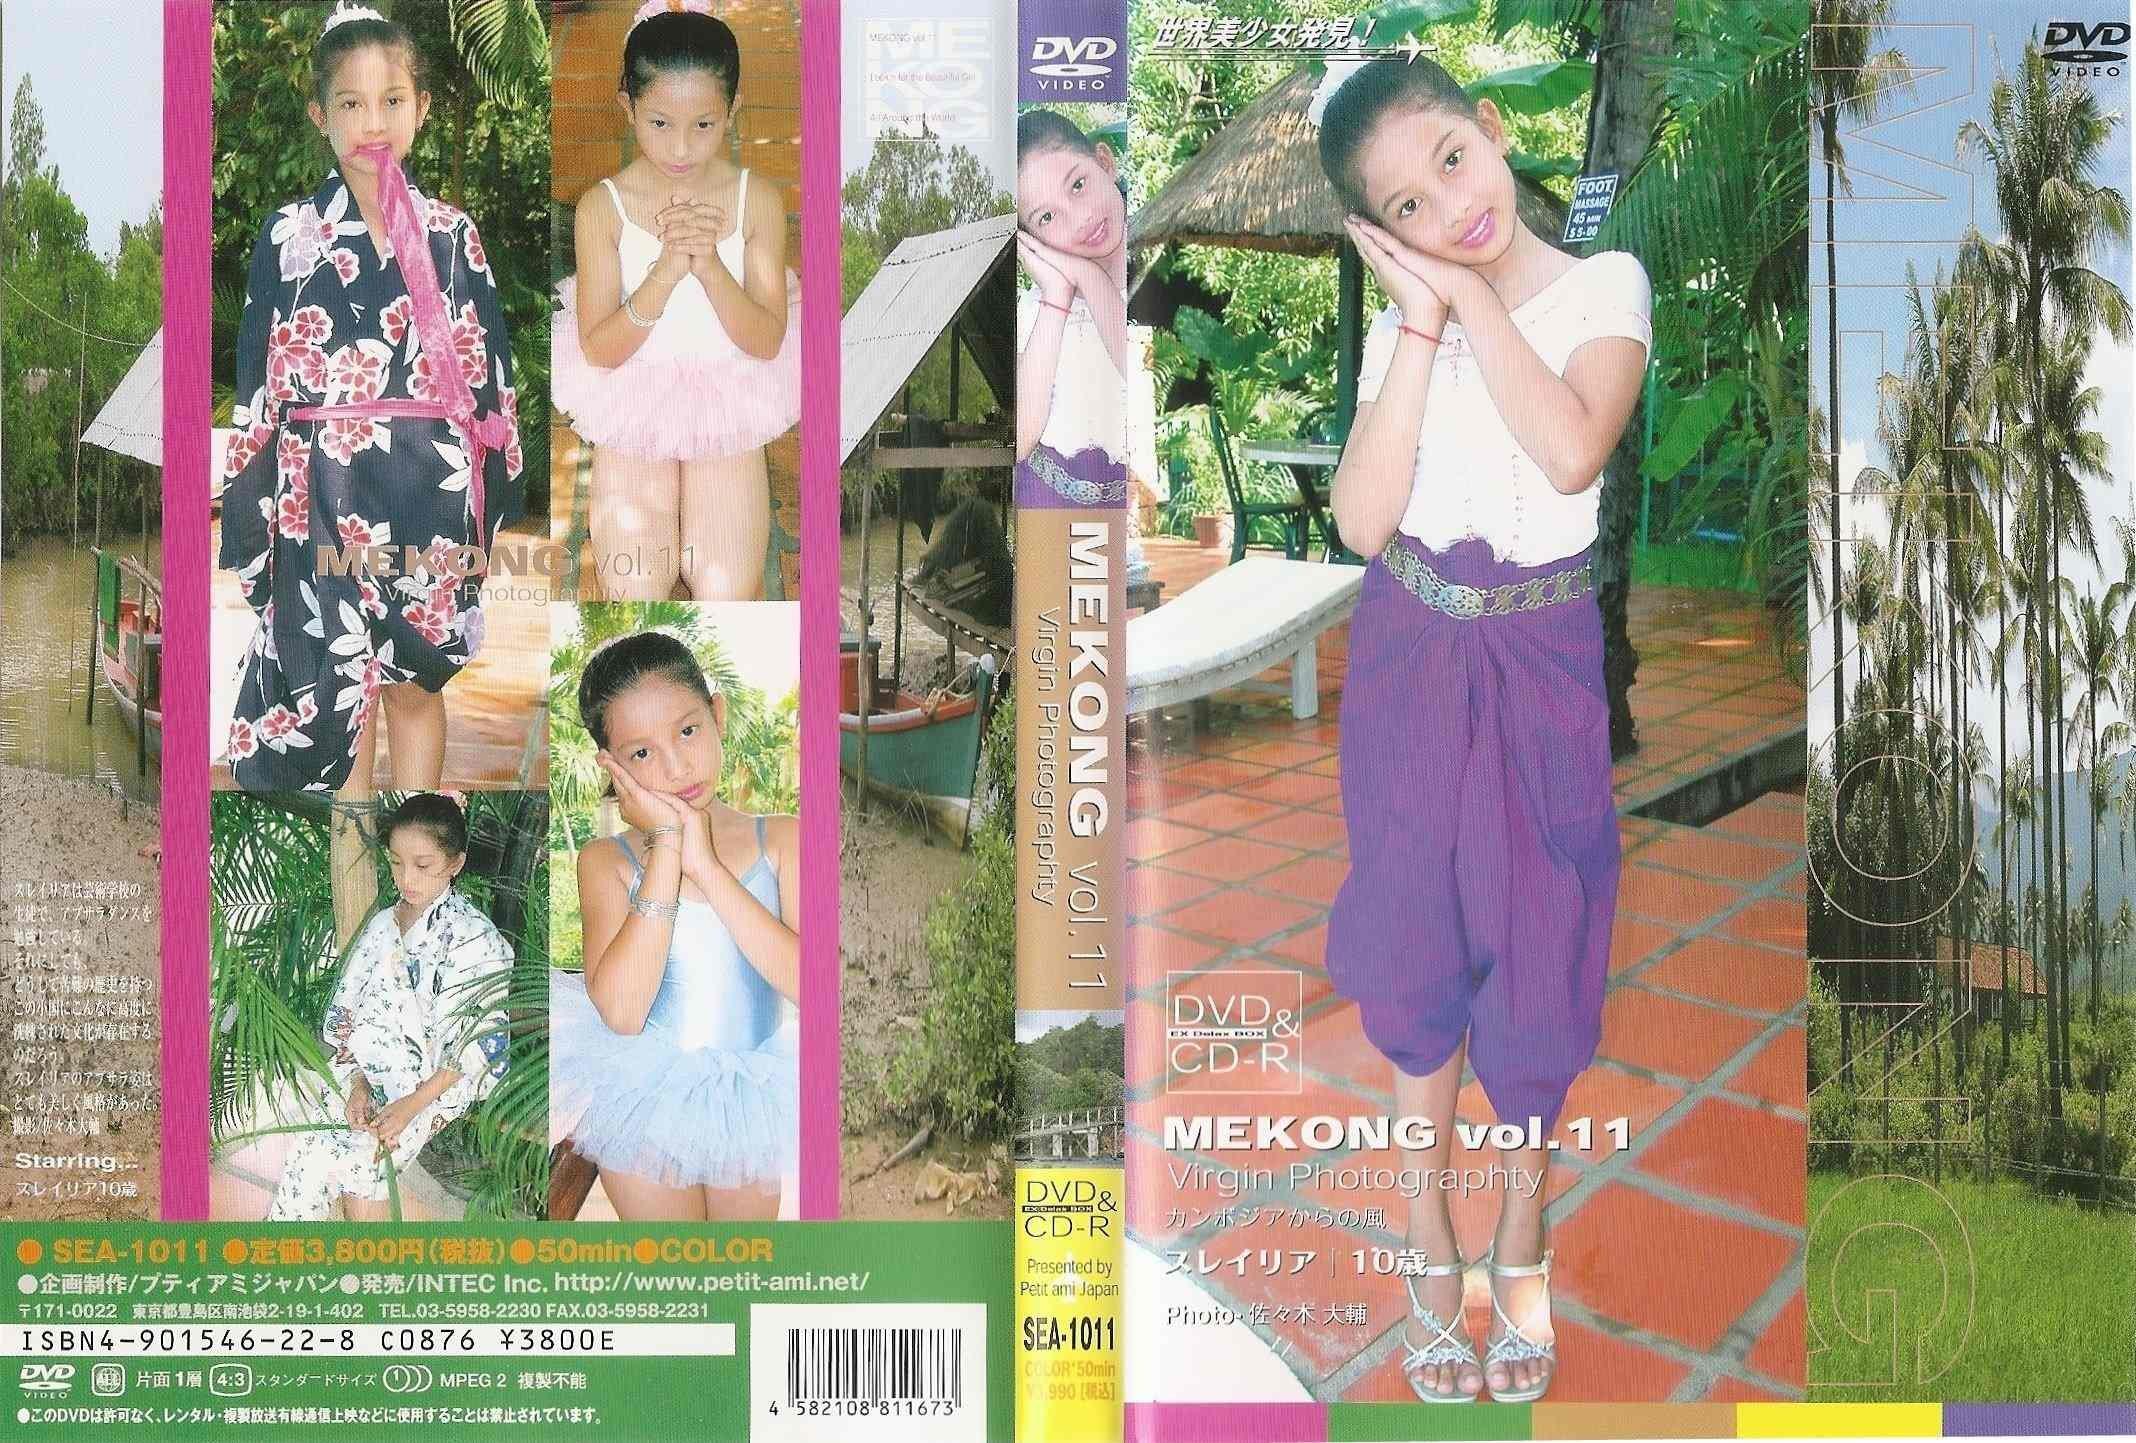 Mekong Vol 11